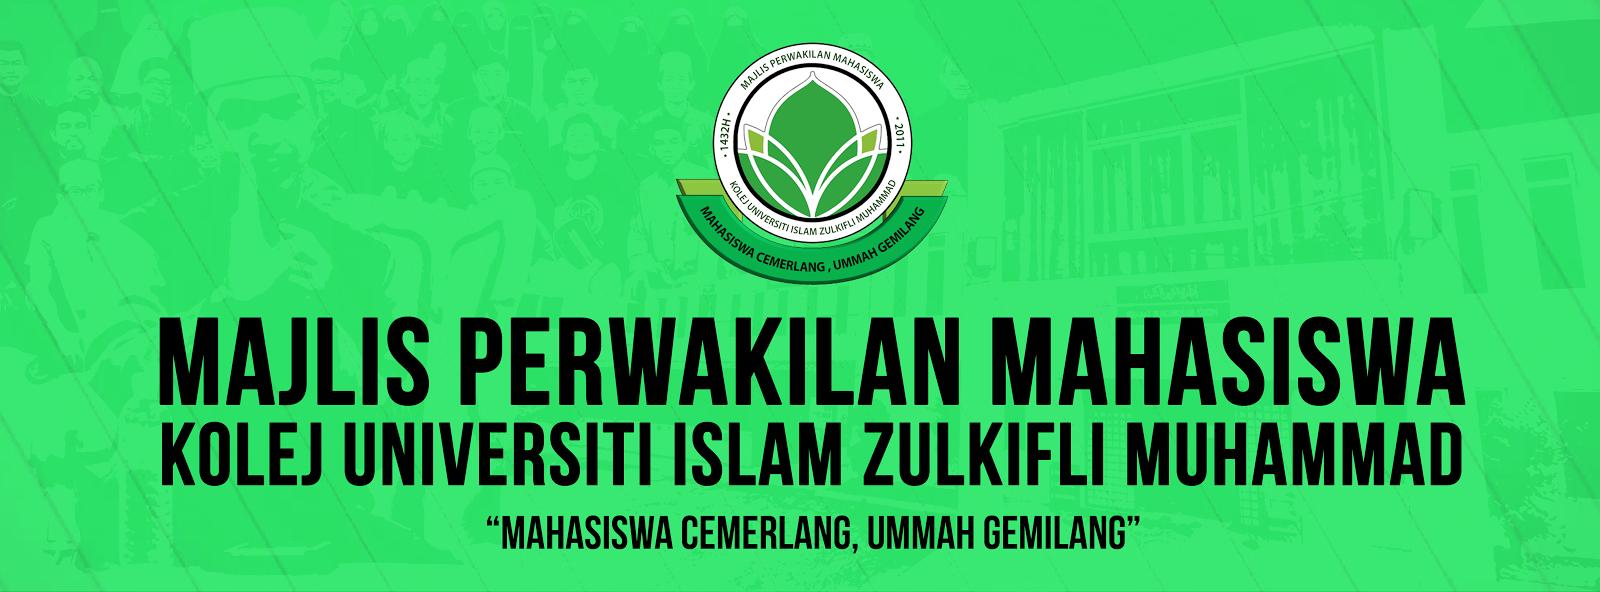 MAJLIS PERWAKILAN MAHASISWA KUIZM